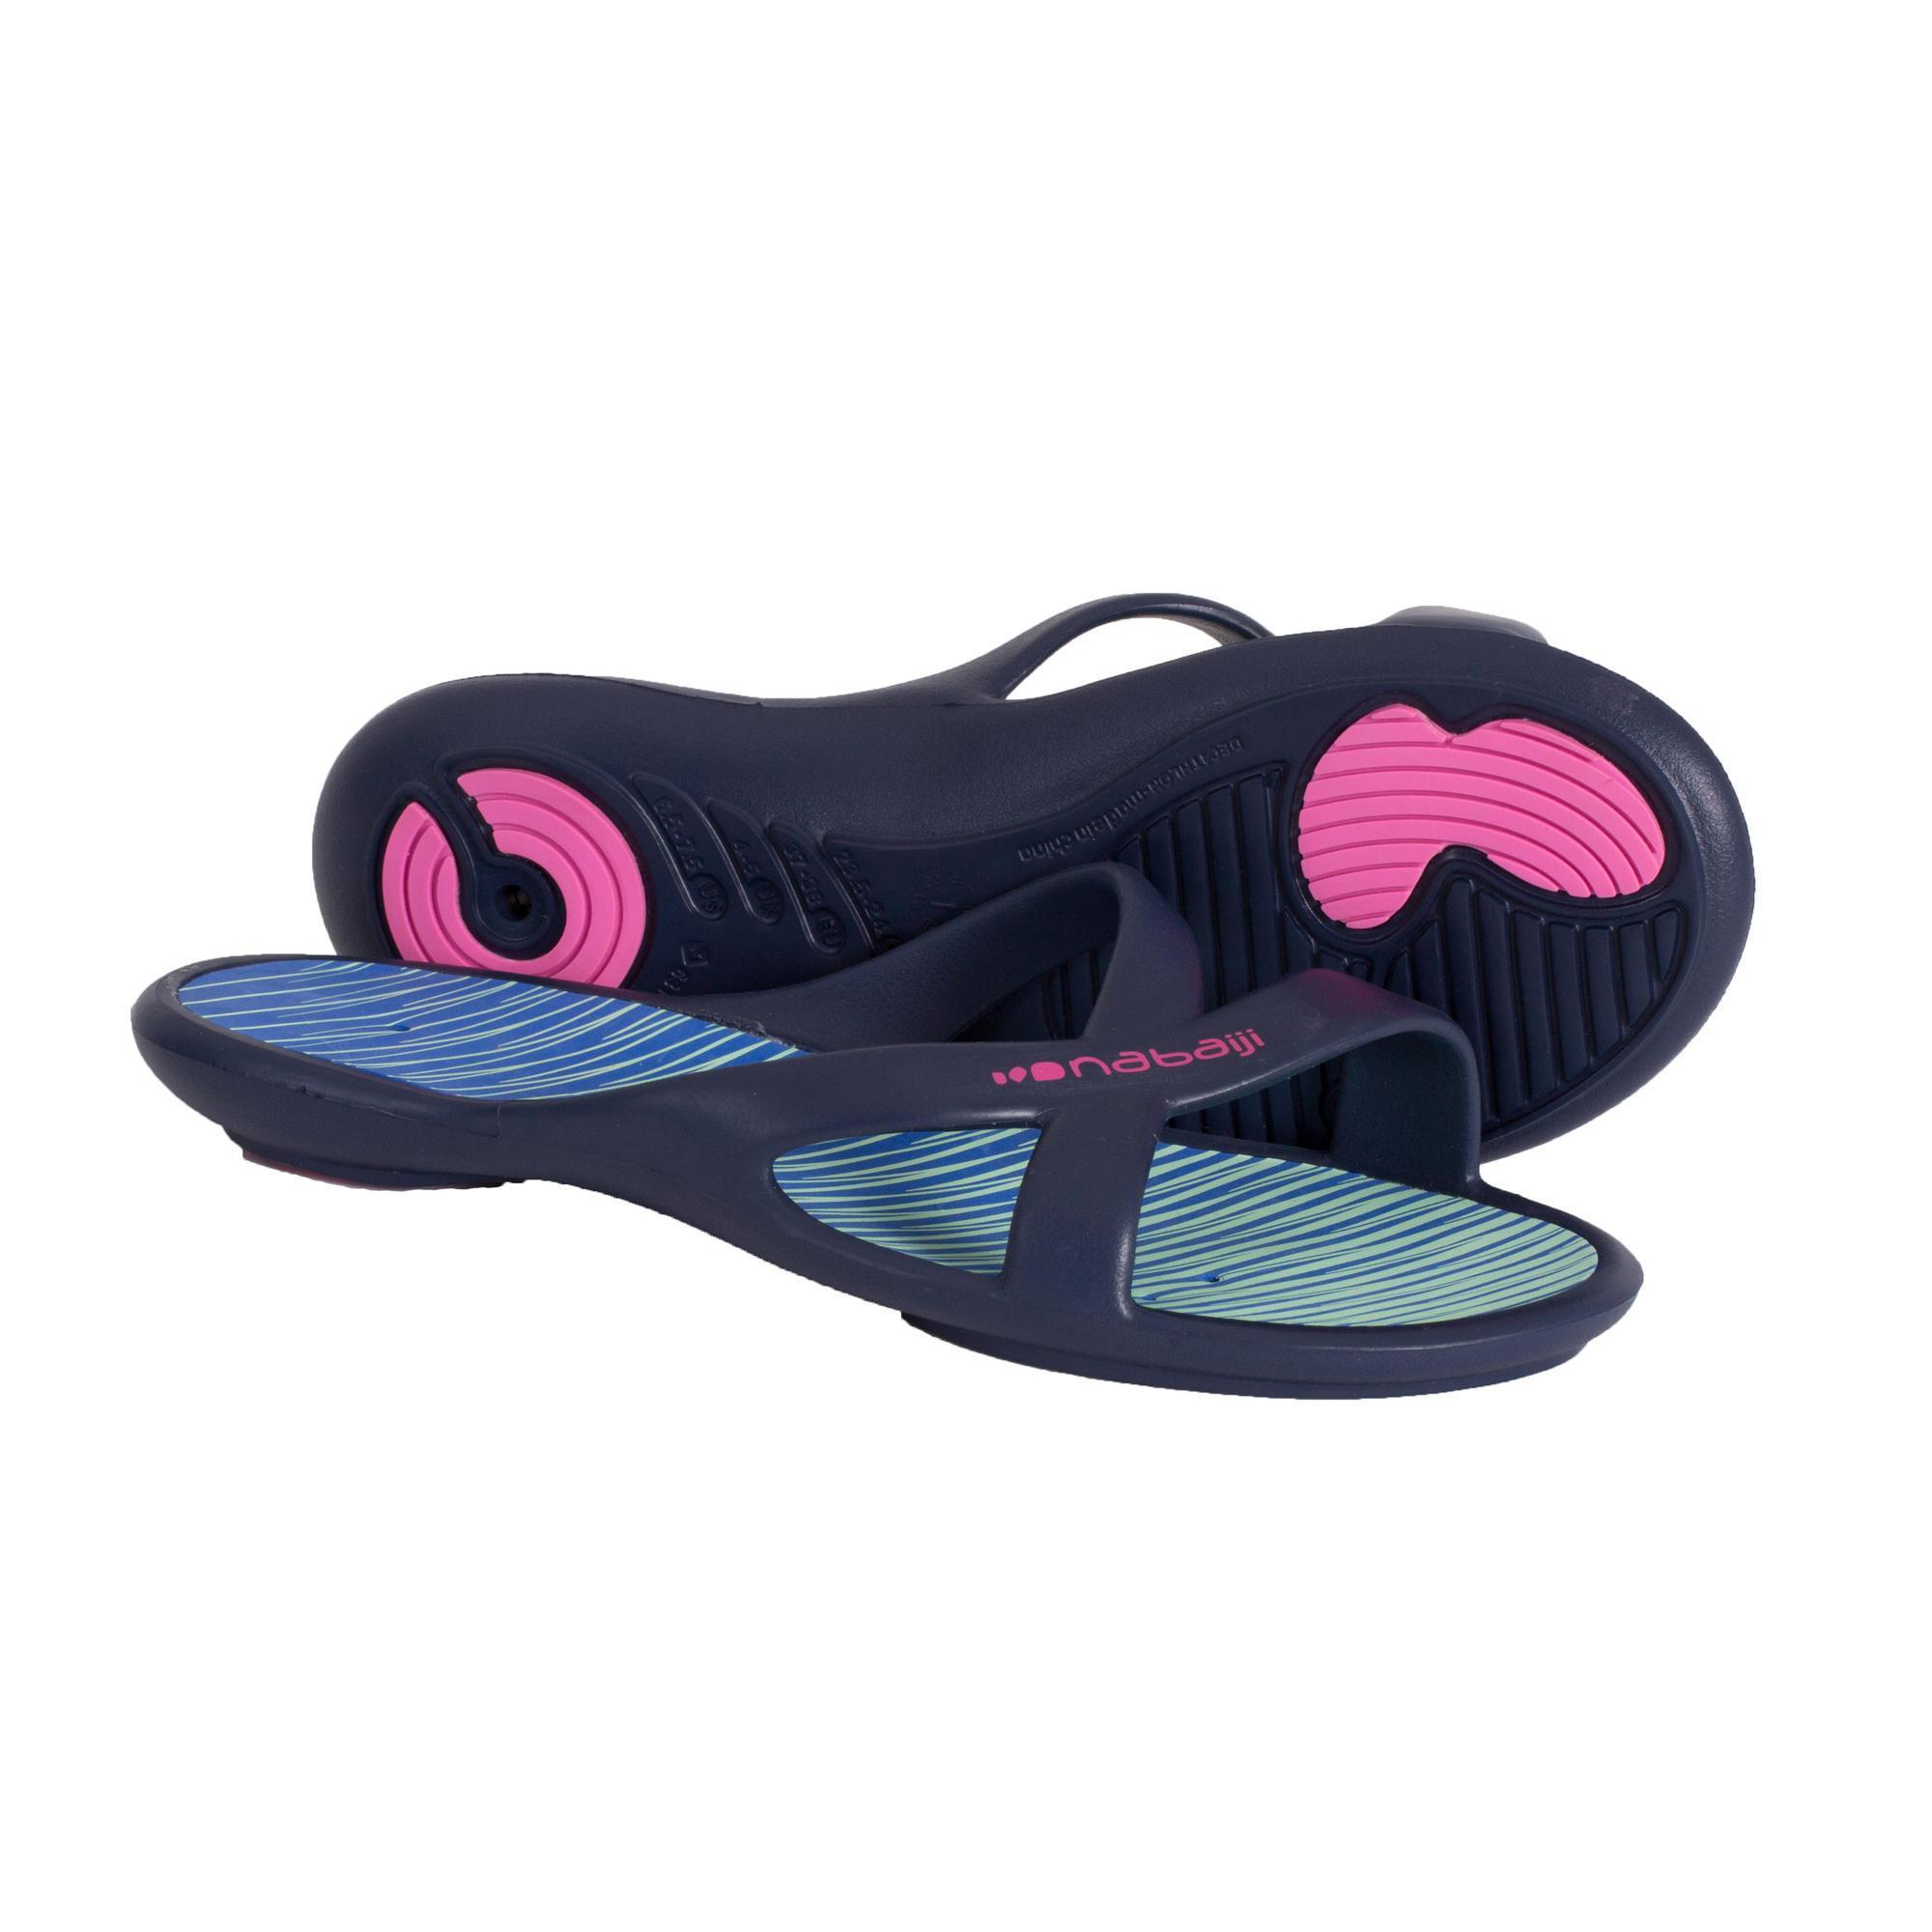 Sandales De Piscine Femme Slap 500 Lay Bleu Vert dedans Sandales De Piscine